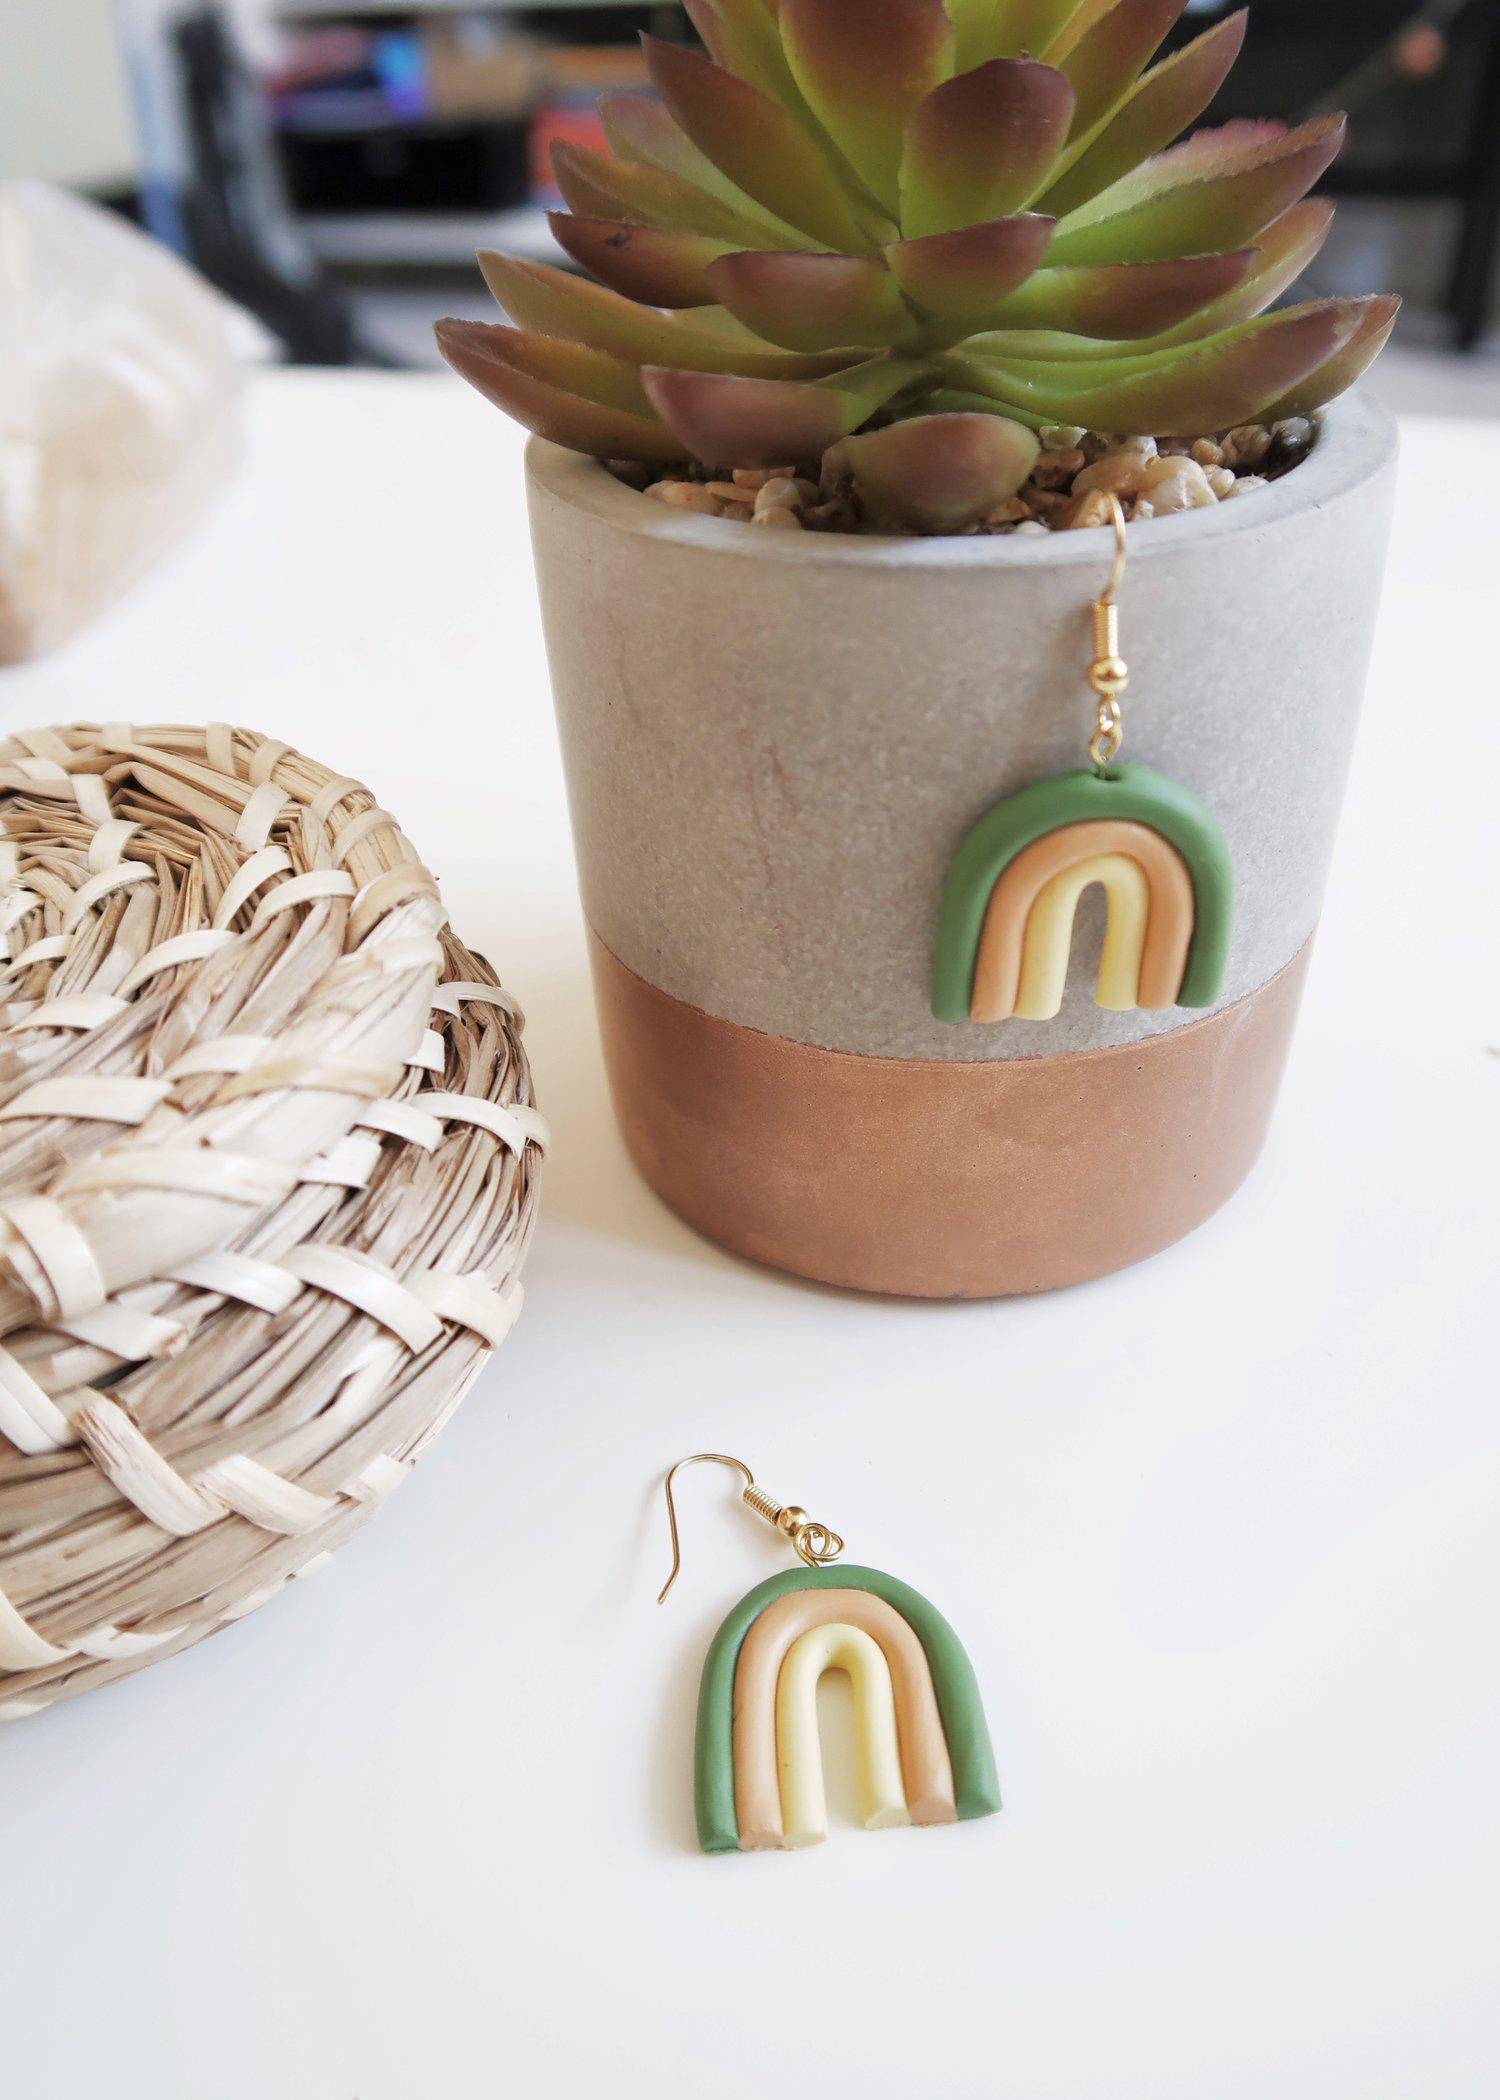 DIY Rainbow Earrings by Isoscella craft tutorial